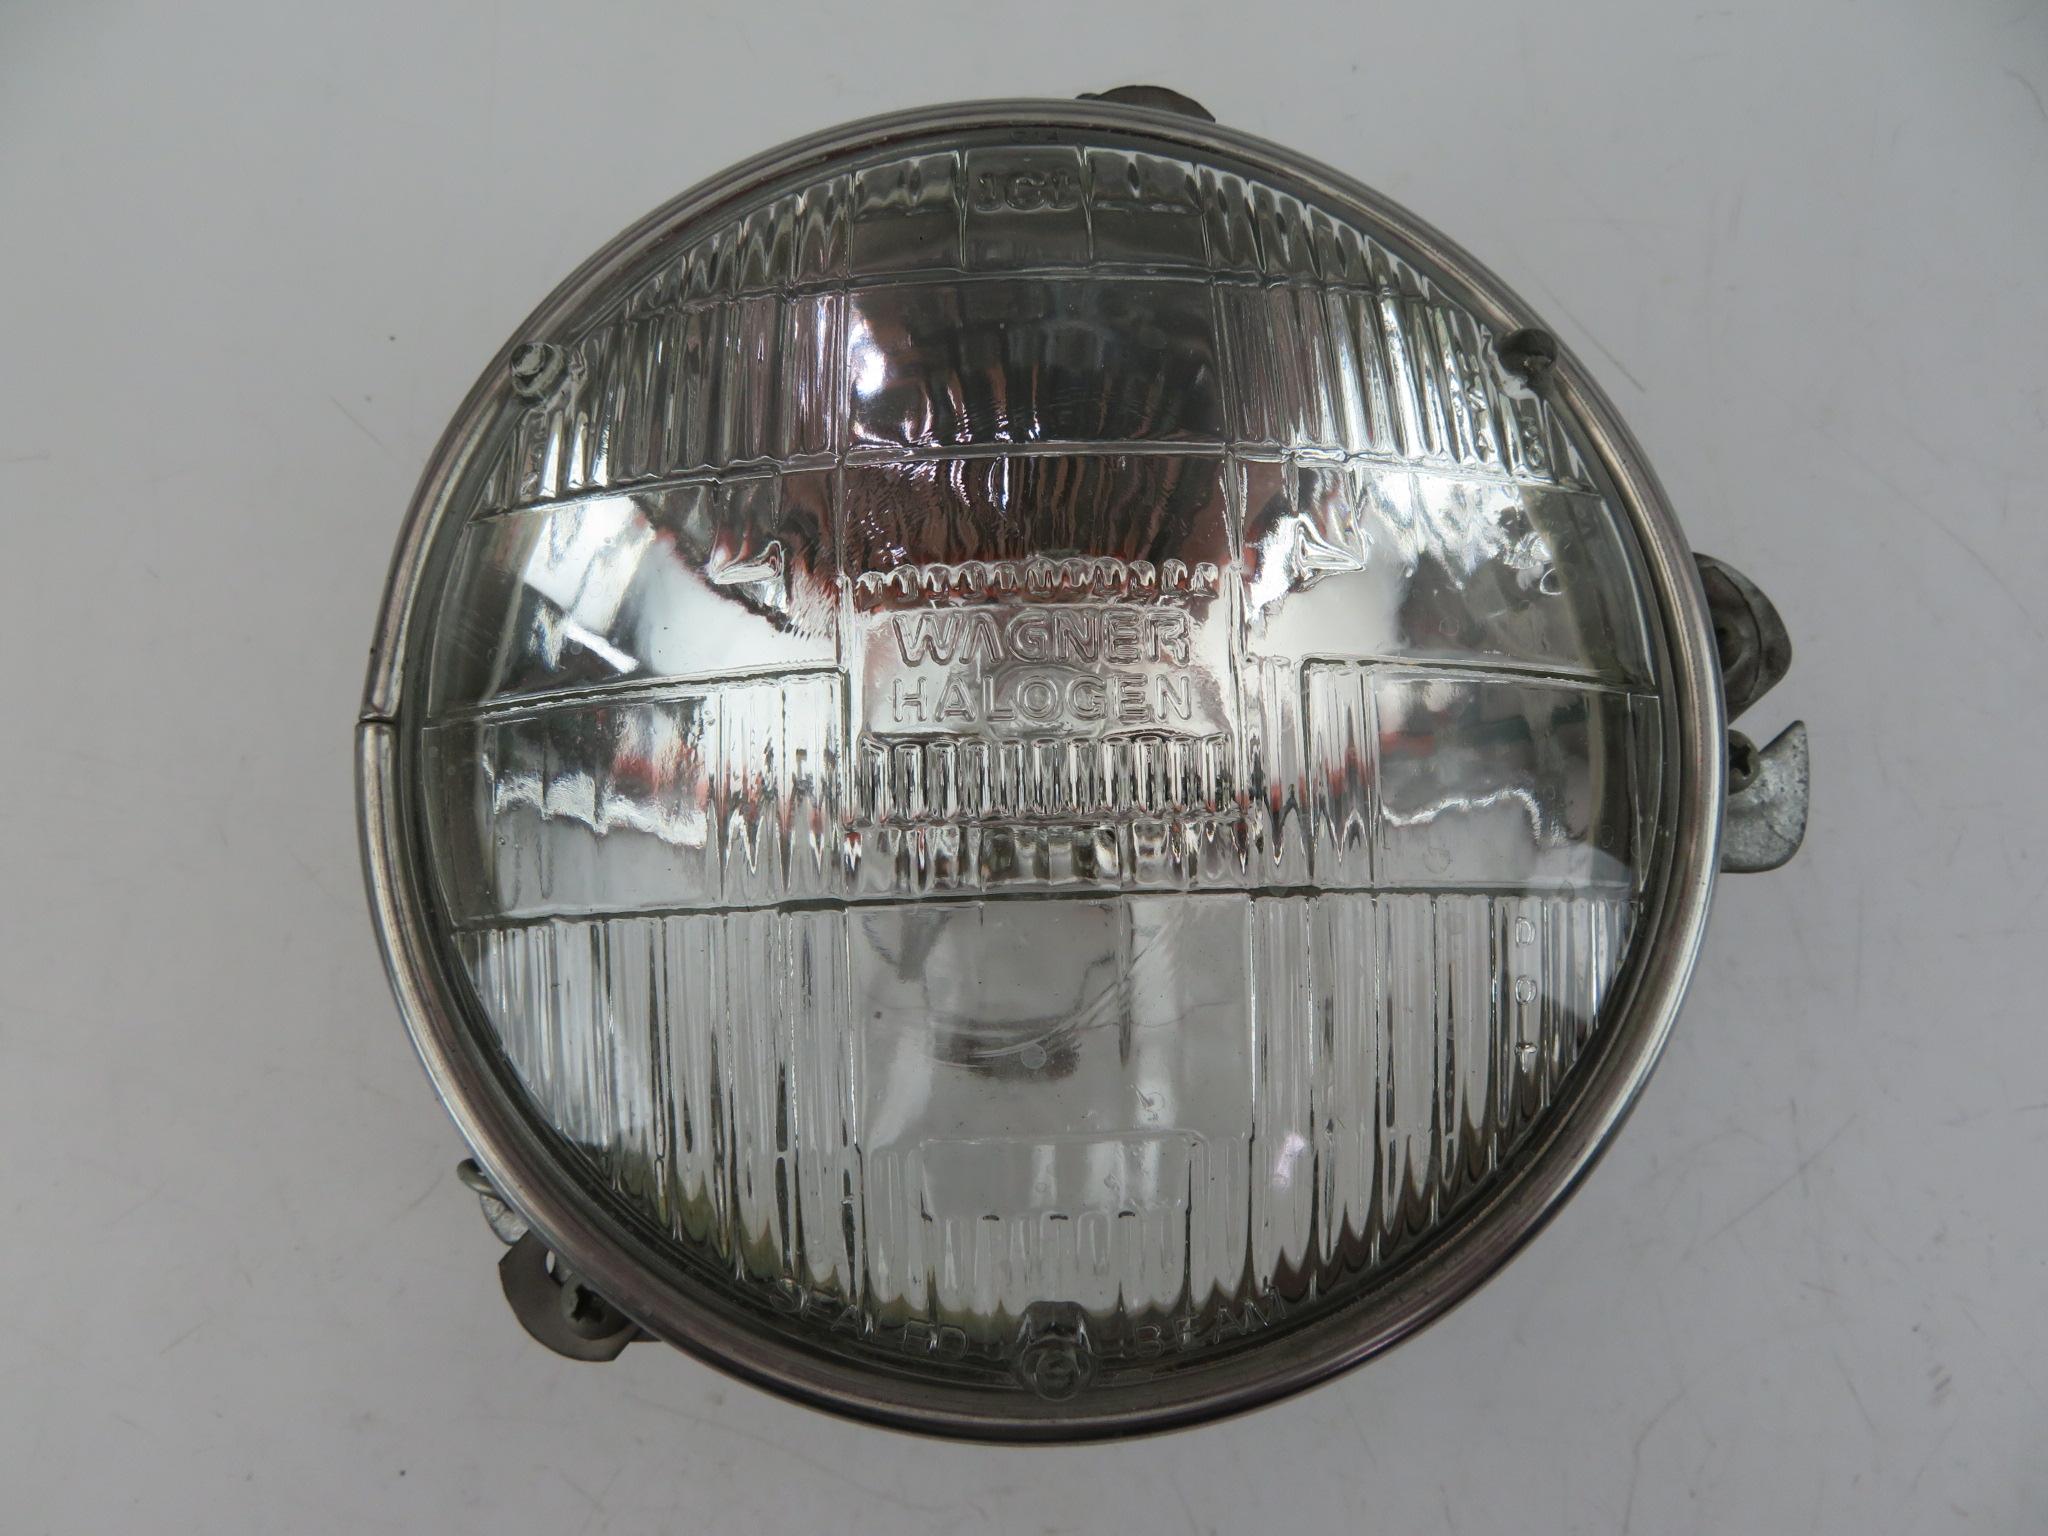 Wagner Lighting 1448221 Automotive Halogen Beam 2c1 Headlight Headlamp Light Ebay